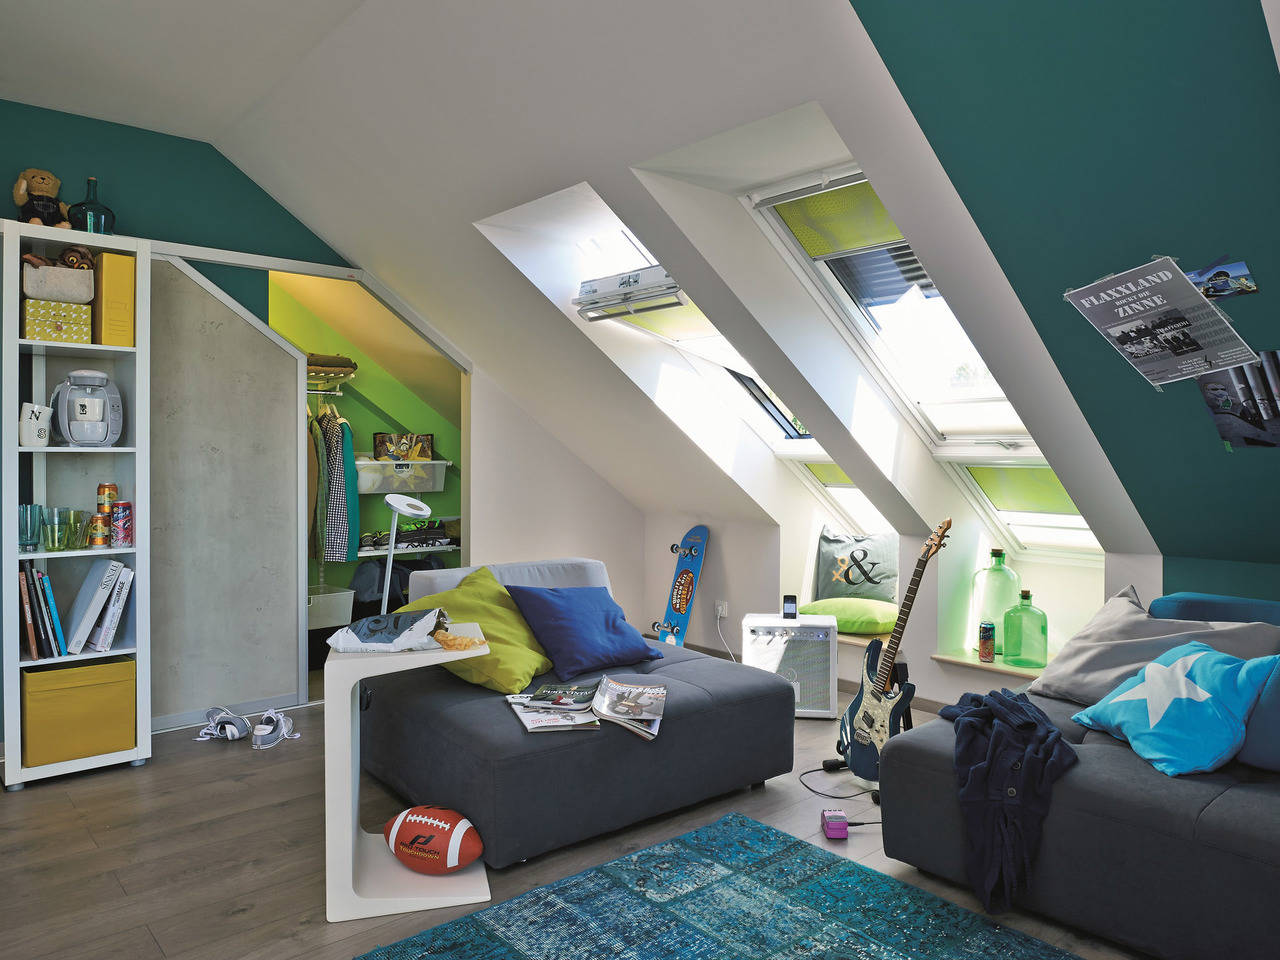 Doppelhaus Maxime 1000 D WOHNIDEE-Haus Kinderzimmer